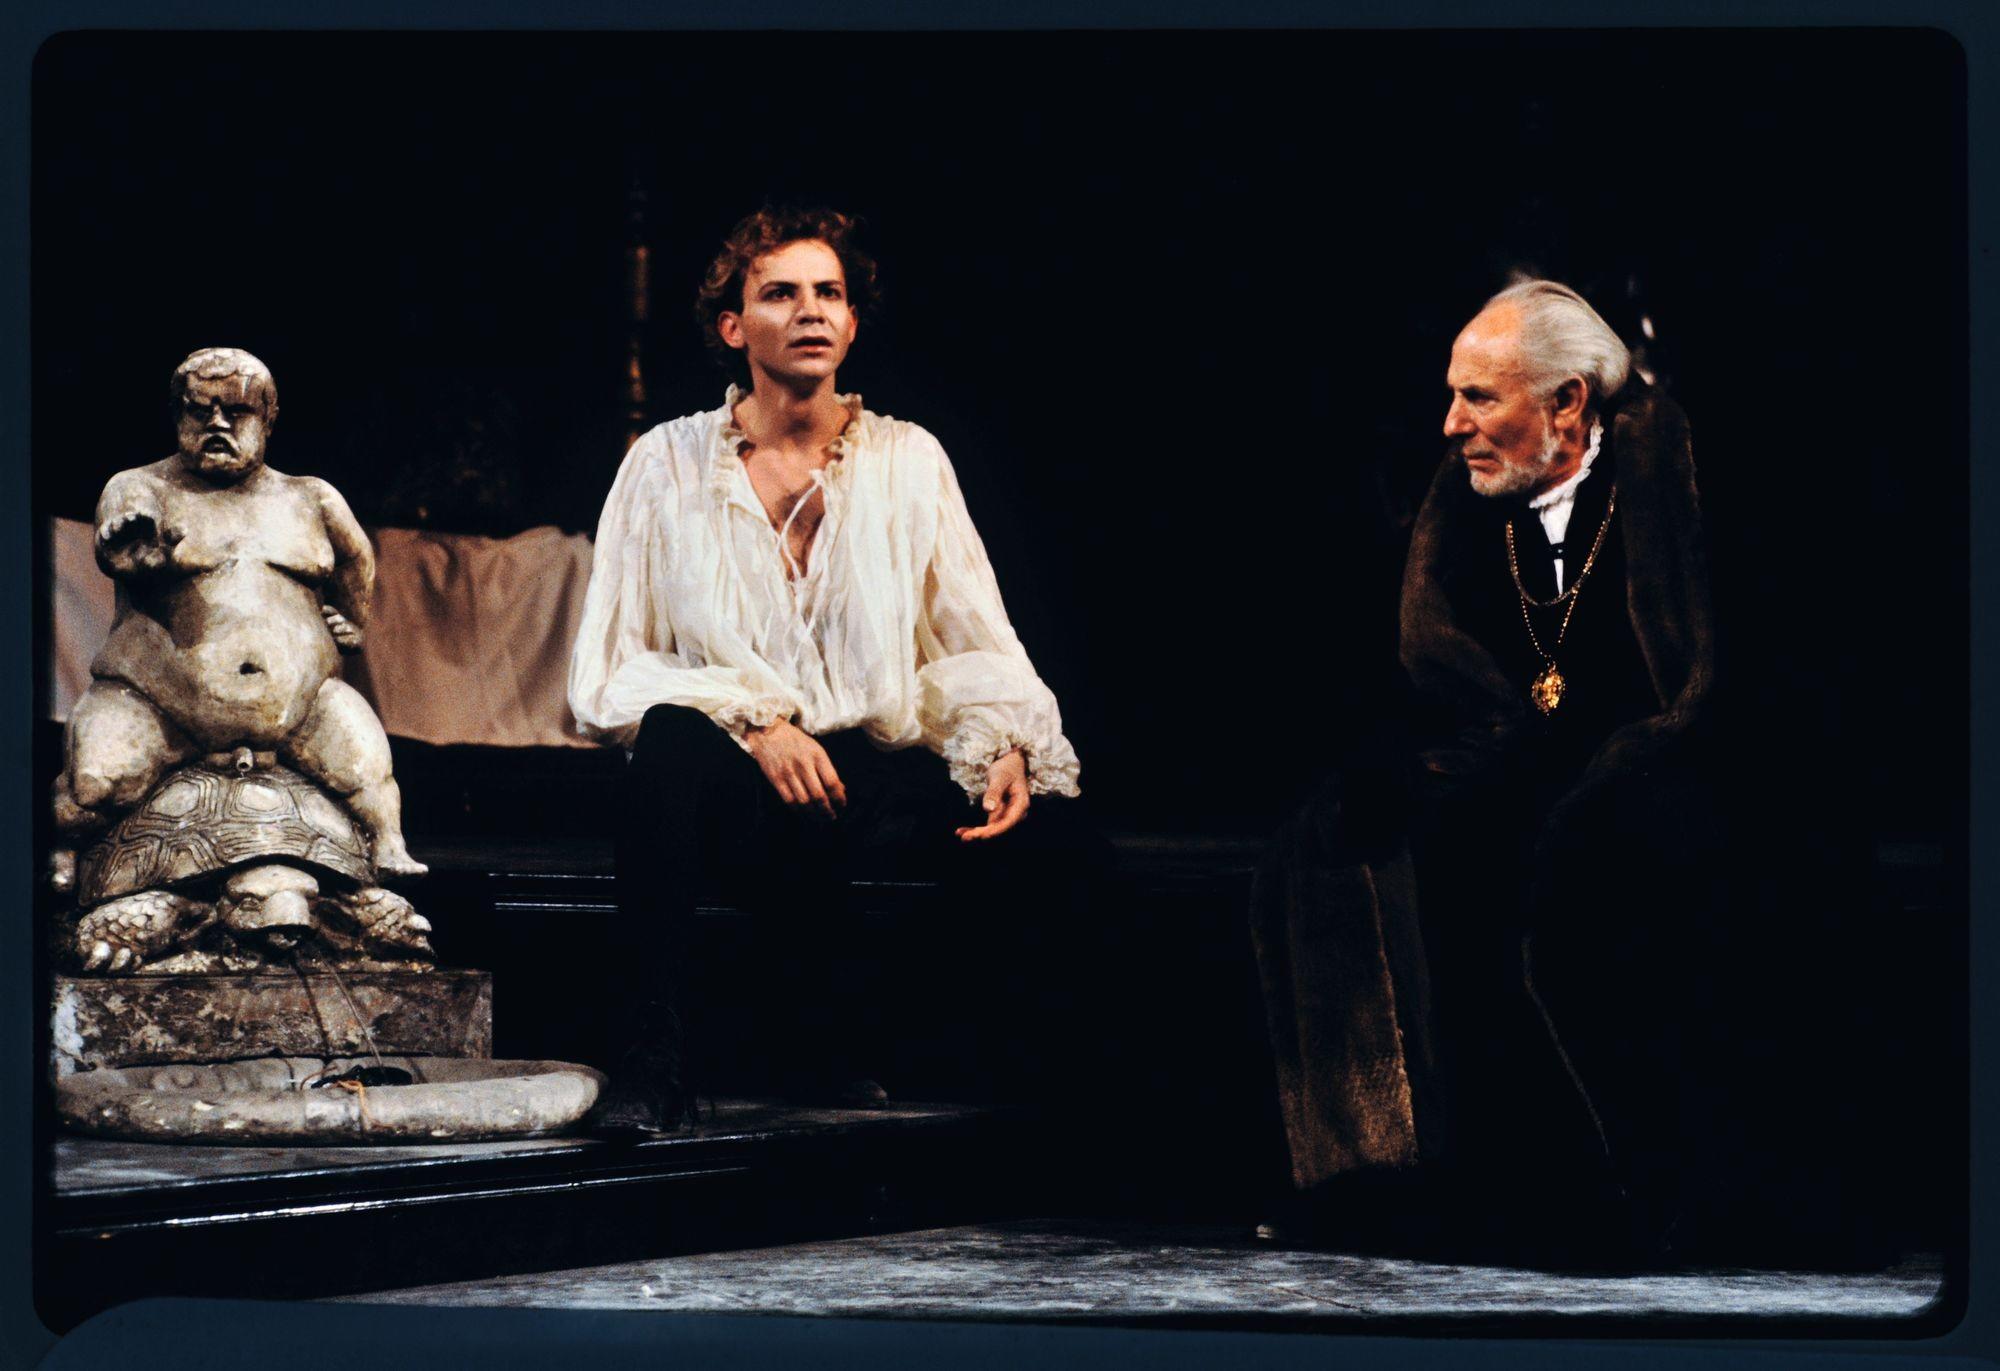 Lorenzaccio, mise en scène de Pierre Vielhescaze, 1984